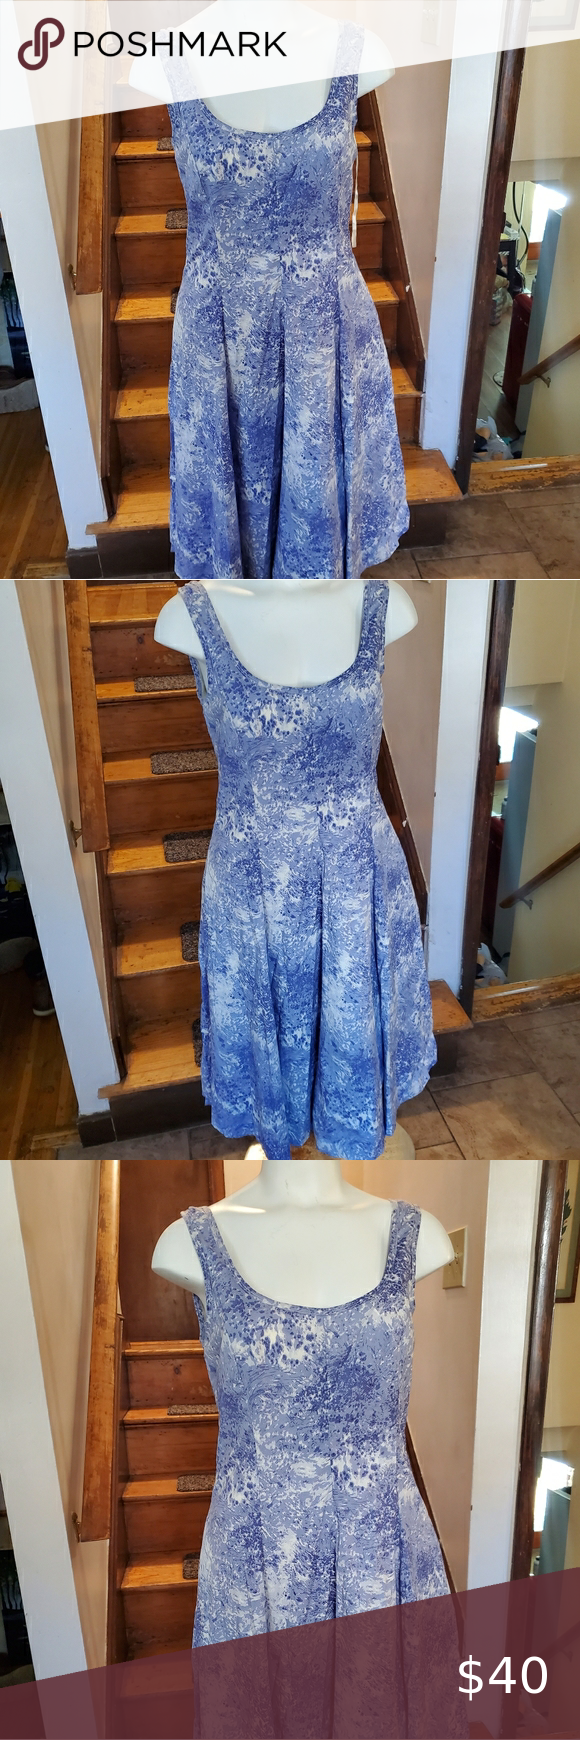 Talbots Blue White Dress Talbots New With Tags Blue And White Dress Talbots Dresses Maxi Blue And White Dress Animal Print Shirt Dress Classic Shirt Dress [ 1740 x 580 Pixel ]